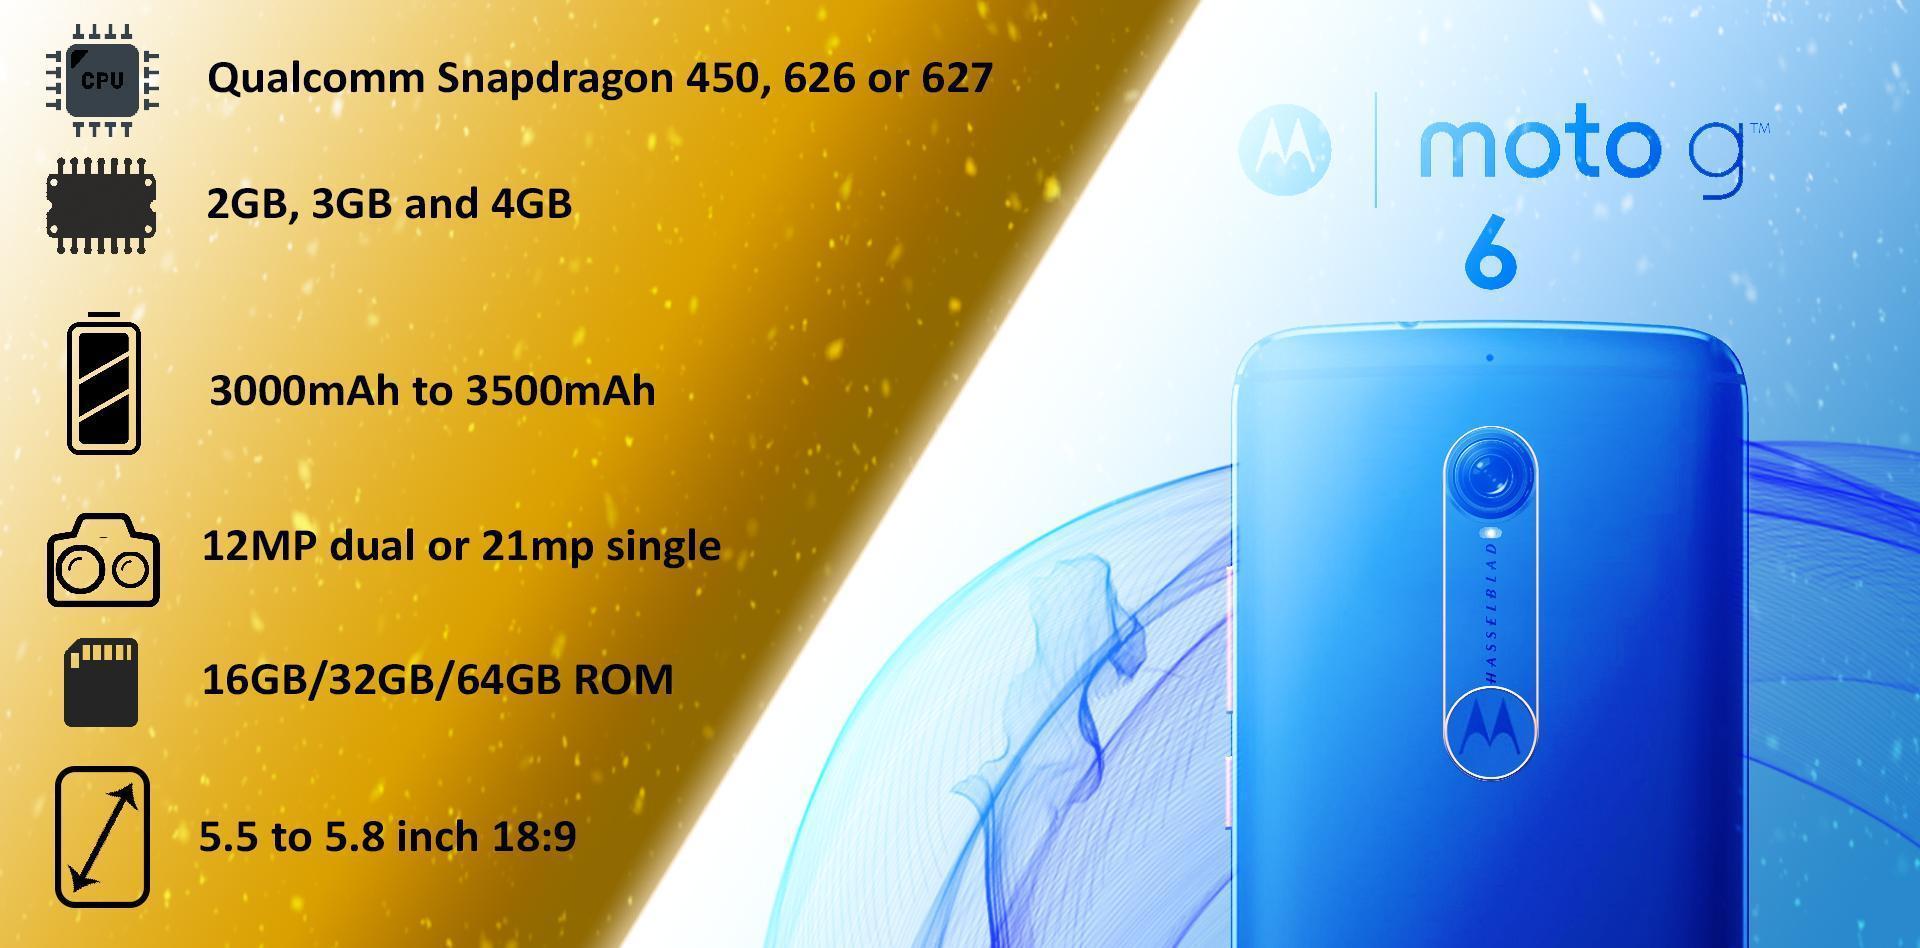 Moto G6 price